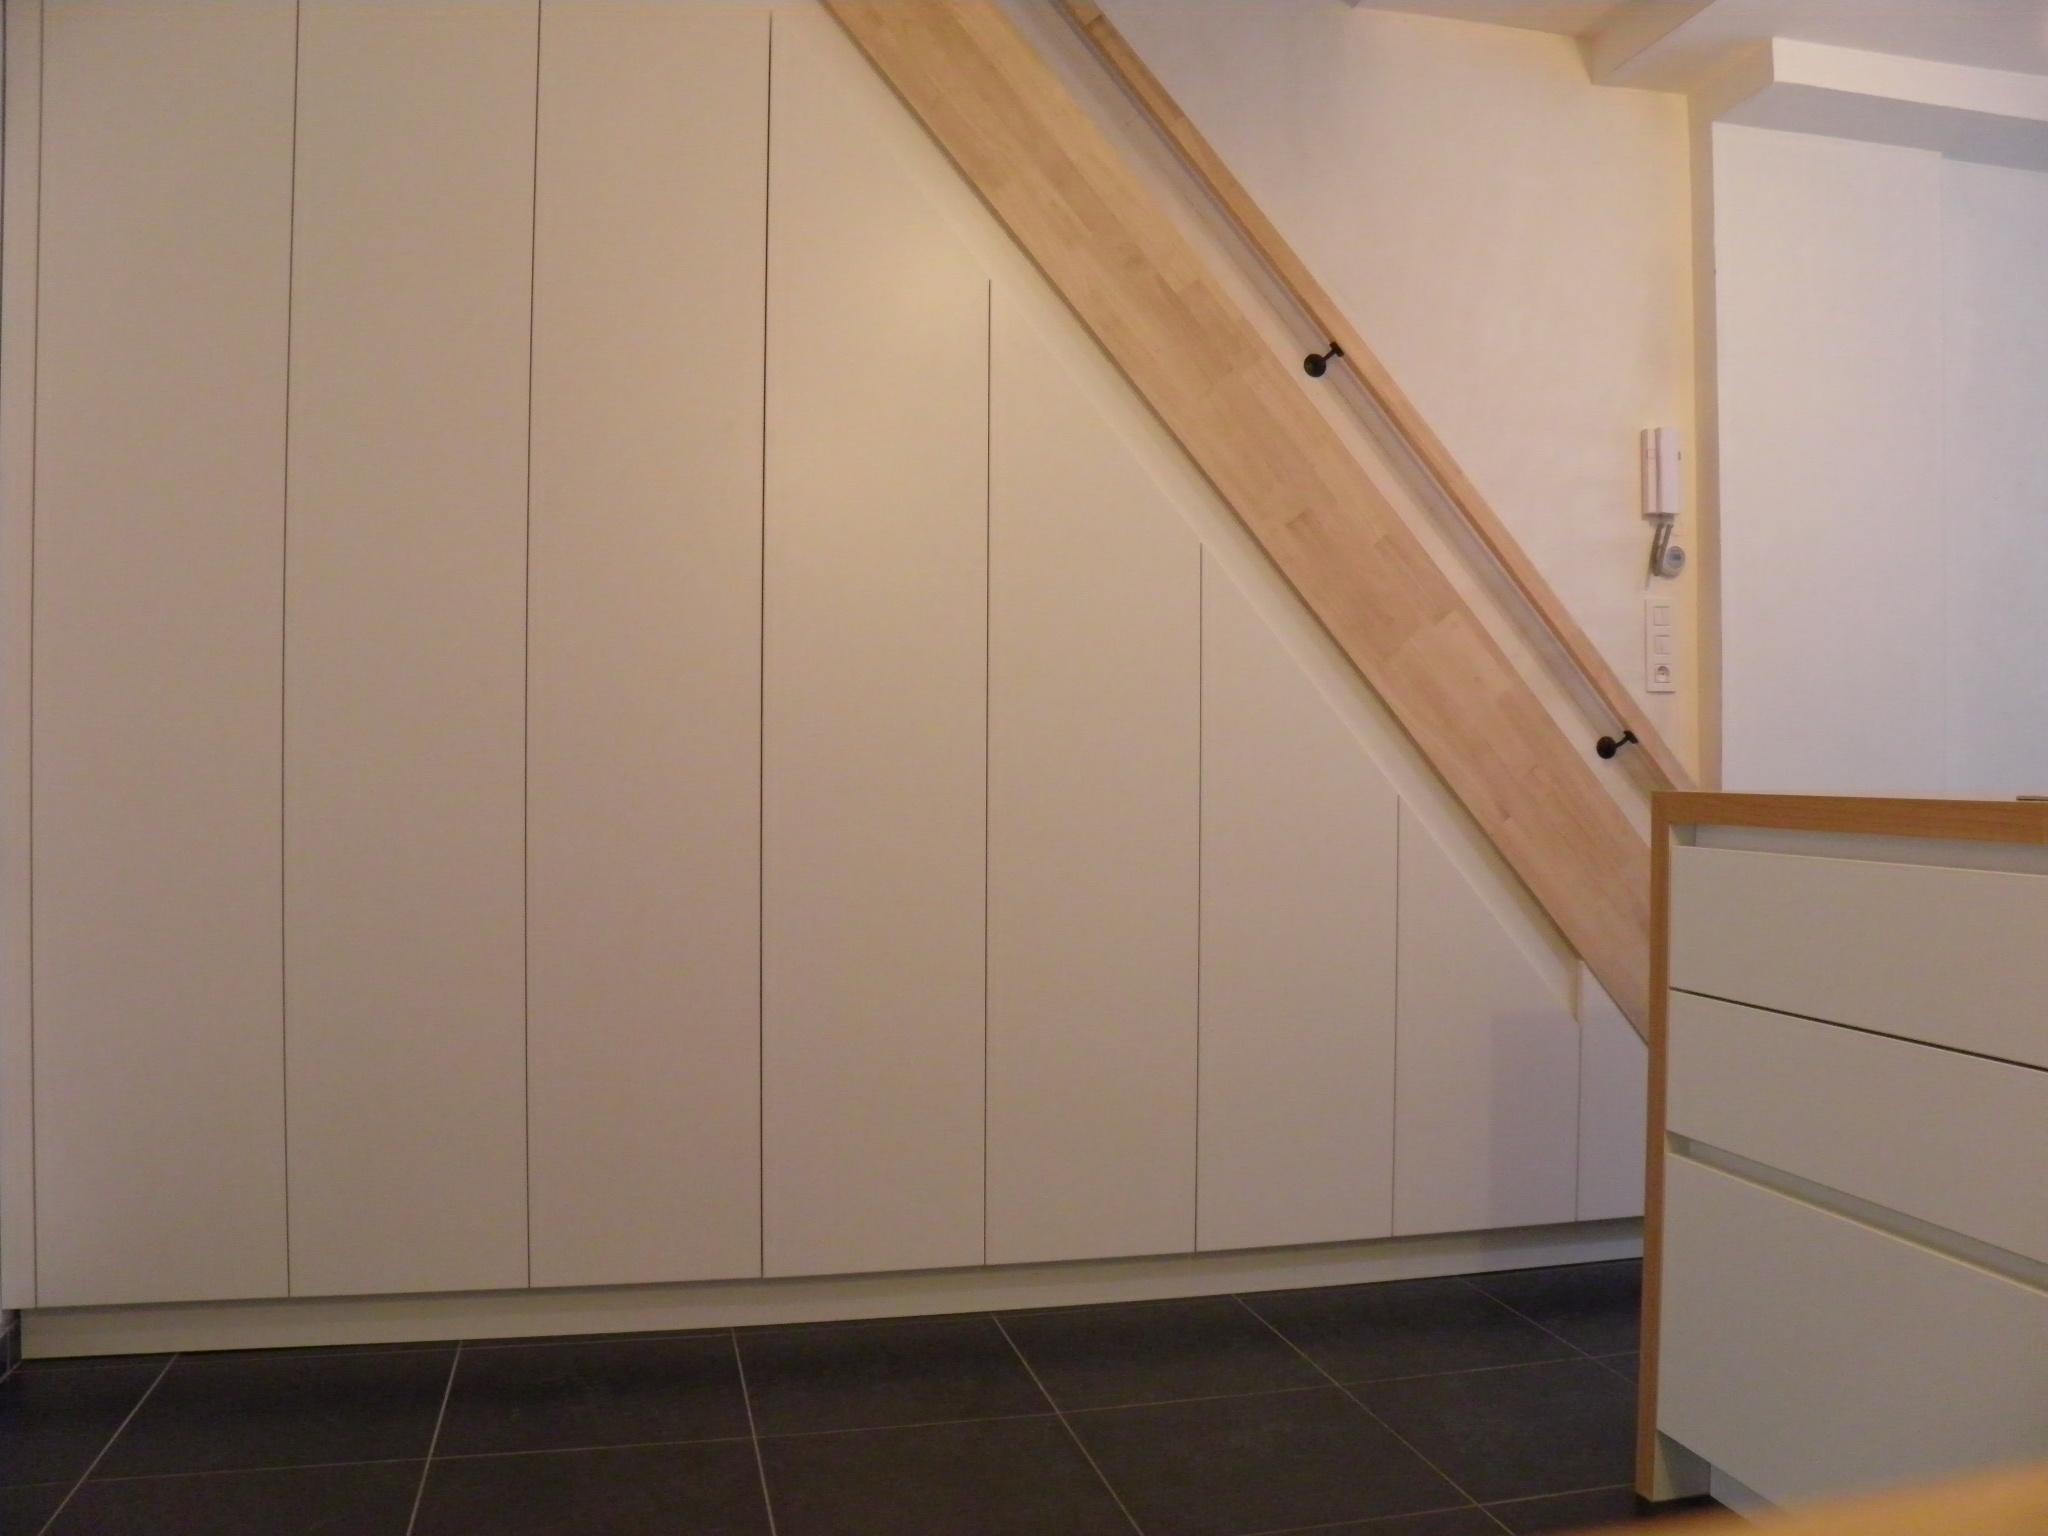 Favoriete Trapkast Maken   Een Kijkje In Onze Trapkast Homelab Interieurstyling #ZX61